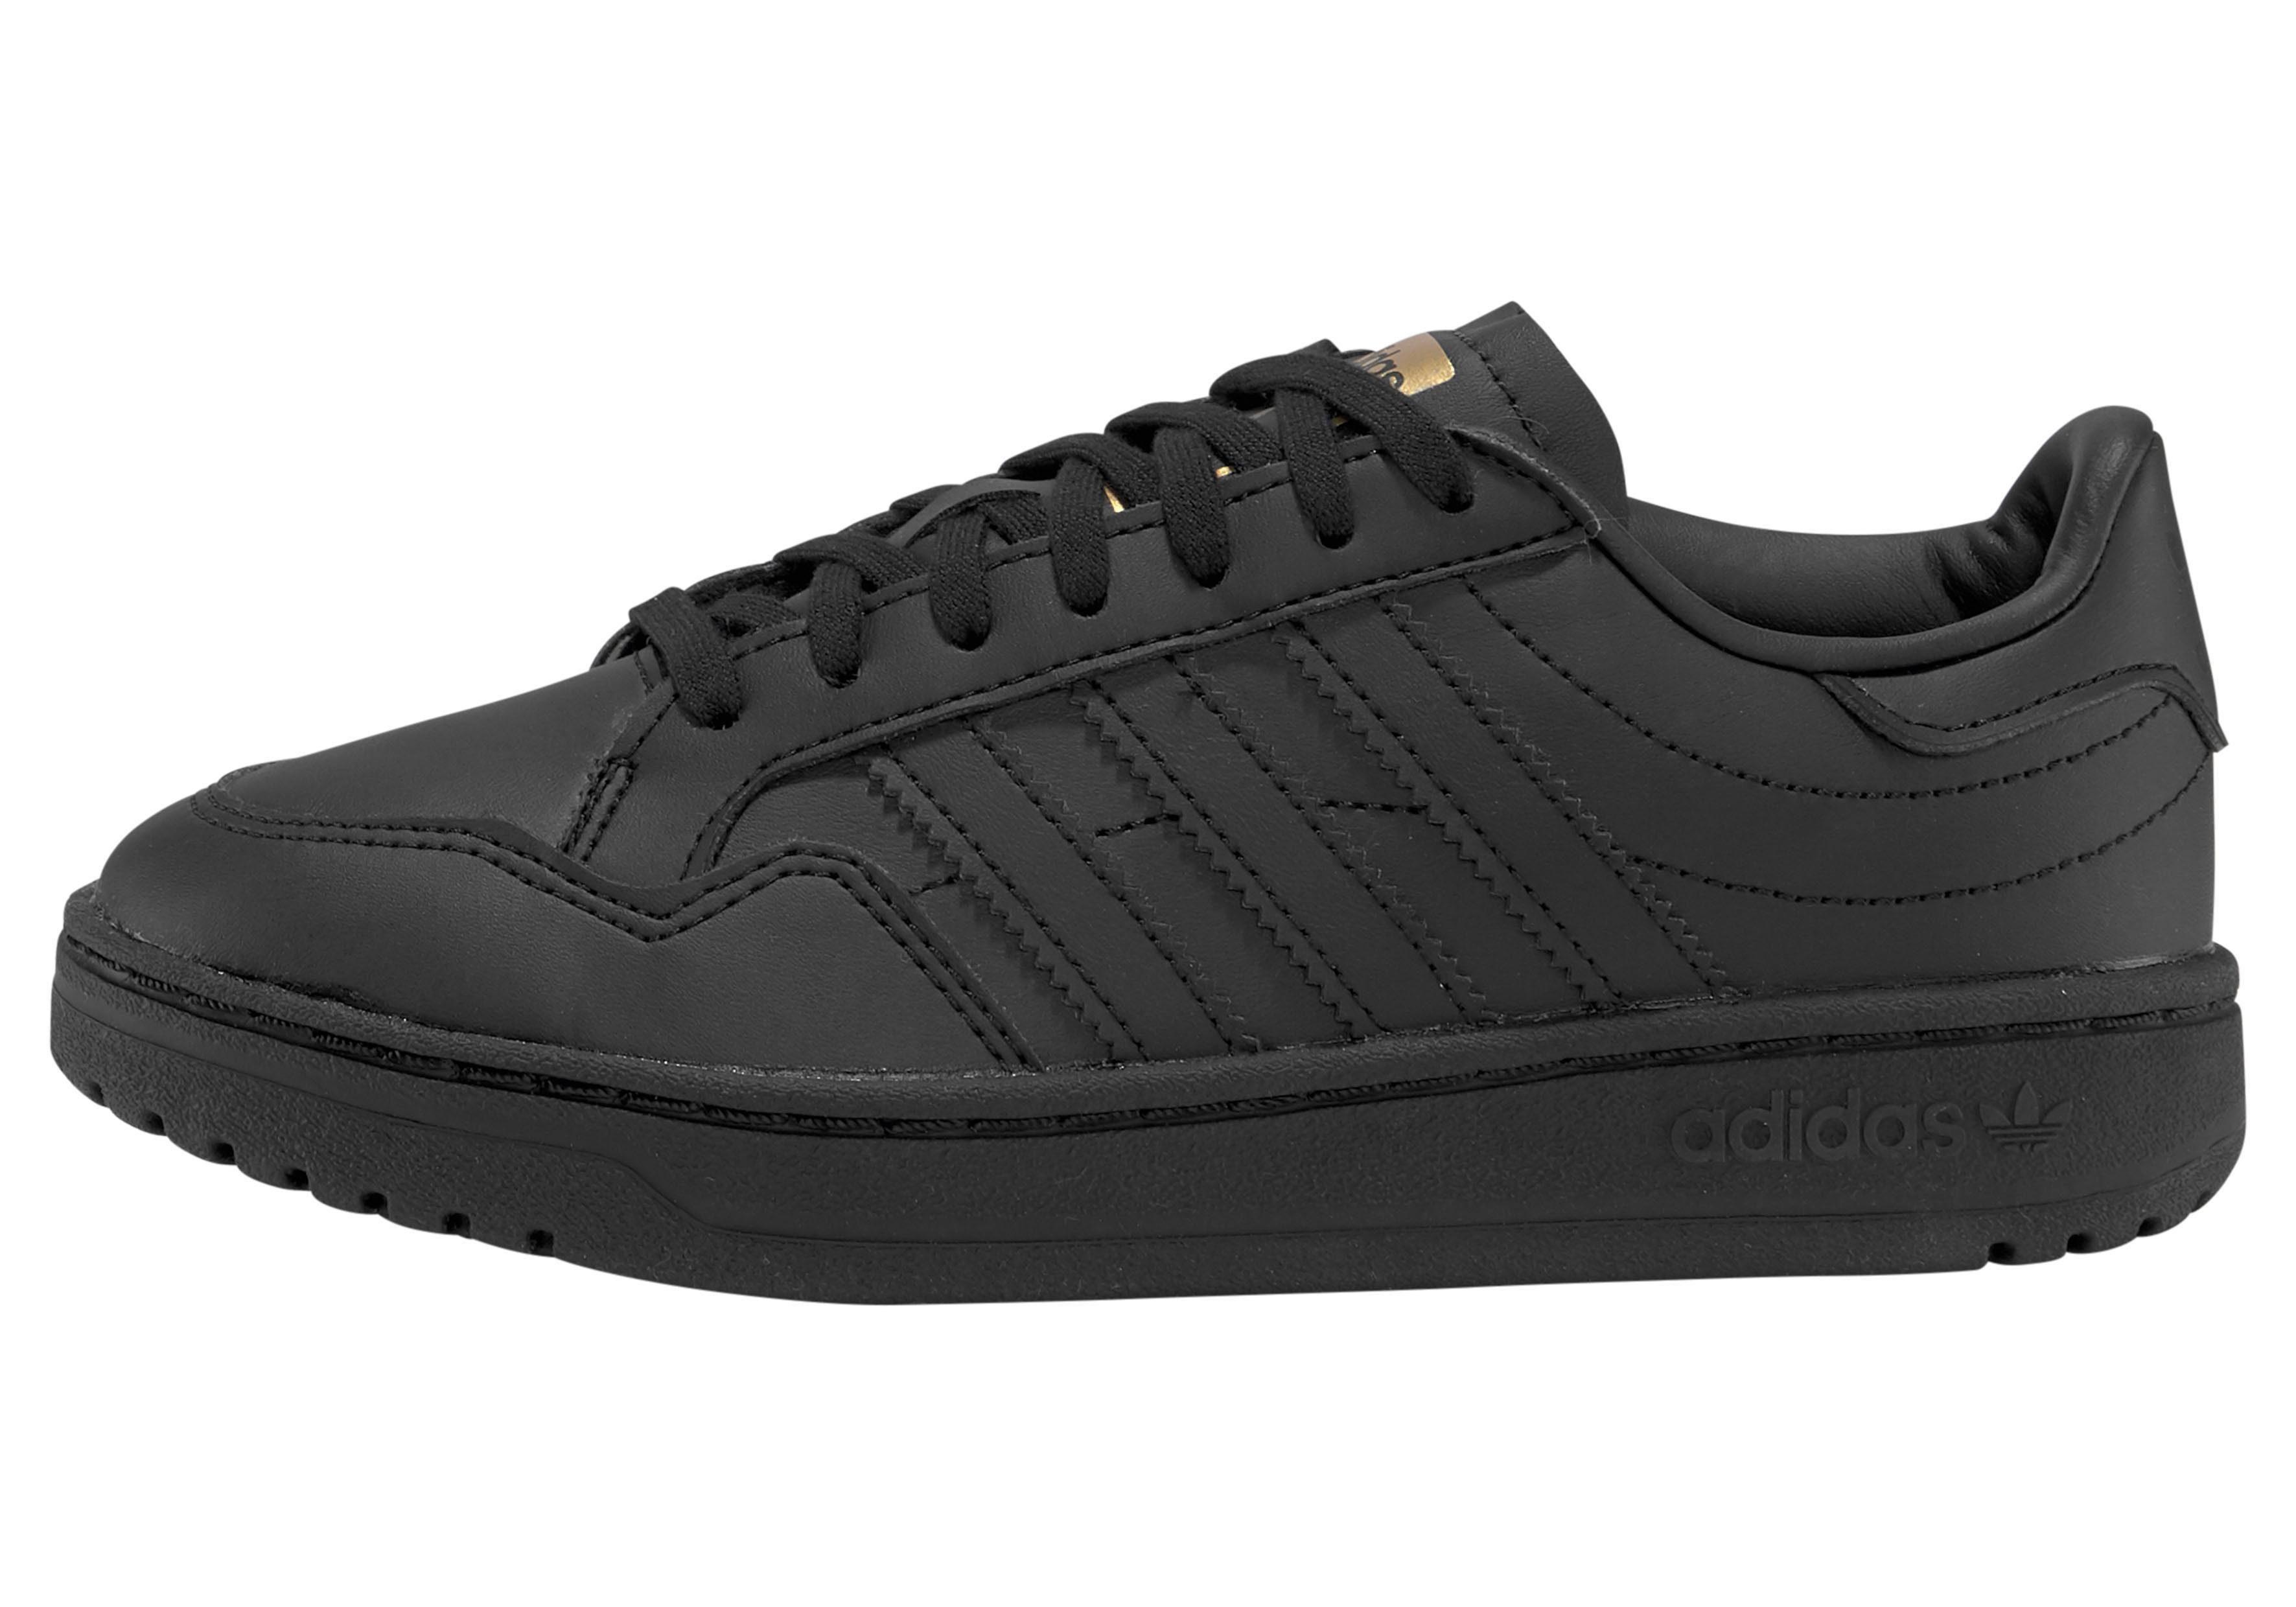 Braun Adidas Sneaker Schuhe Basic Low Rutschhemmende Campus